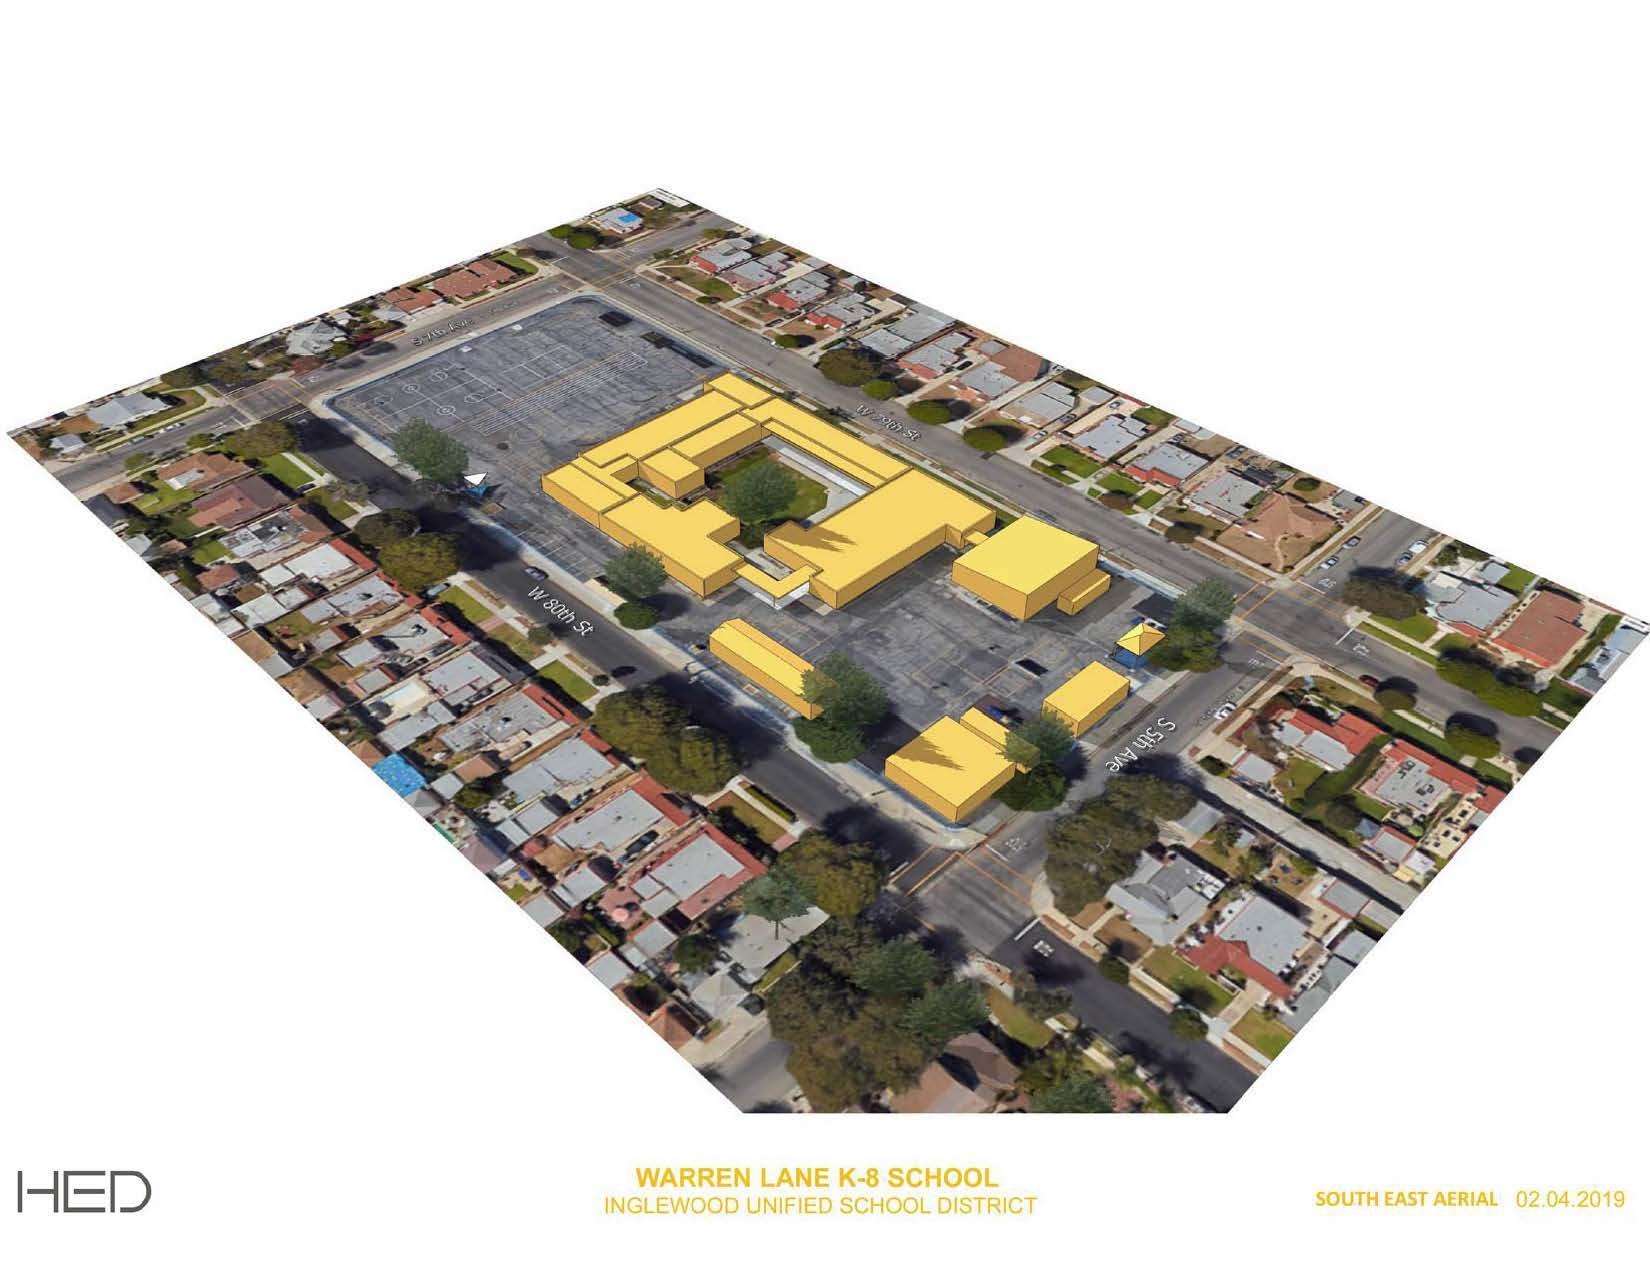 Warren Lane Elementary